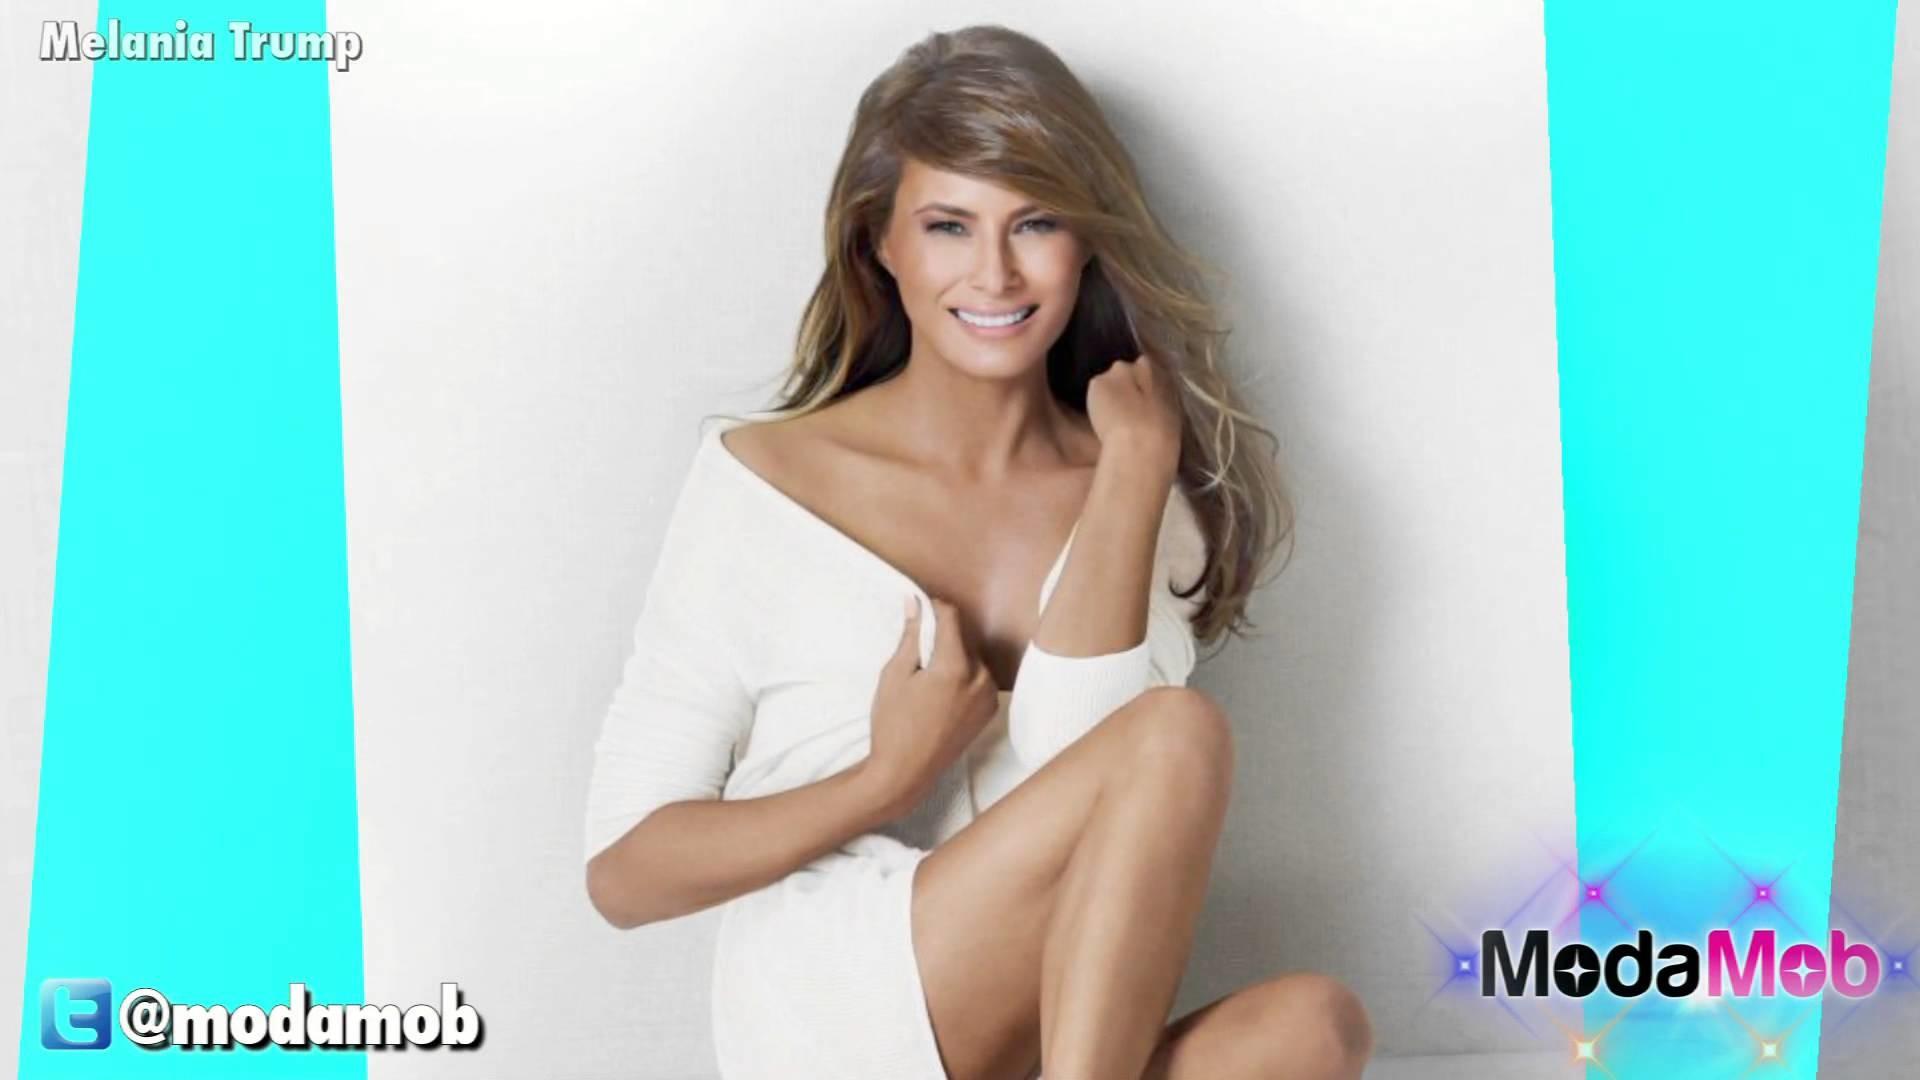 Like A Pro: Skincare Tips From Melania Trump